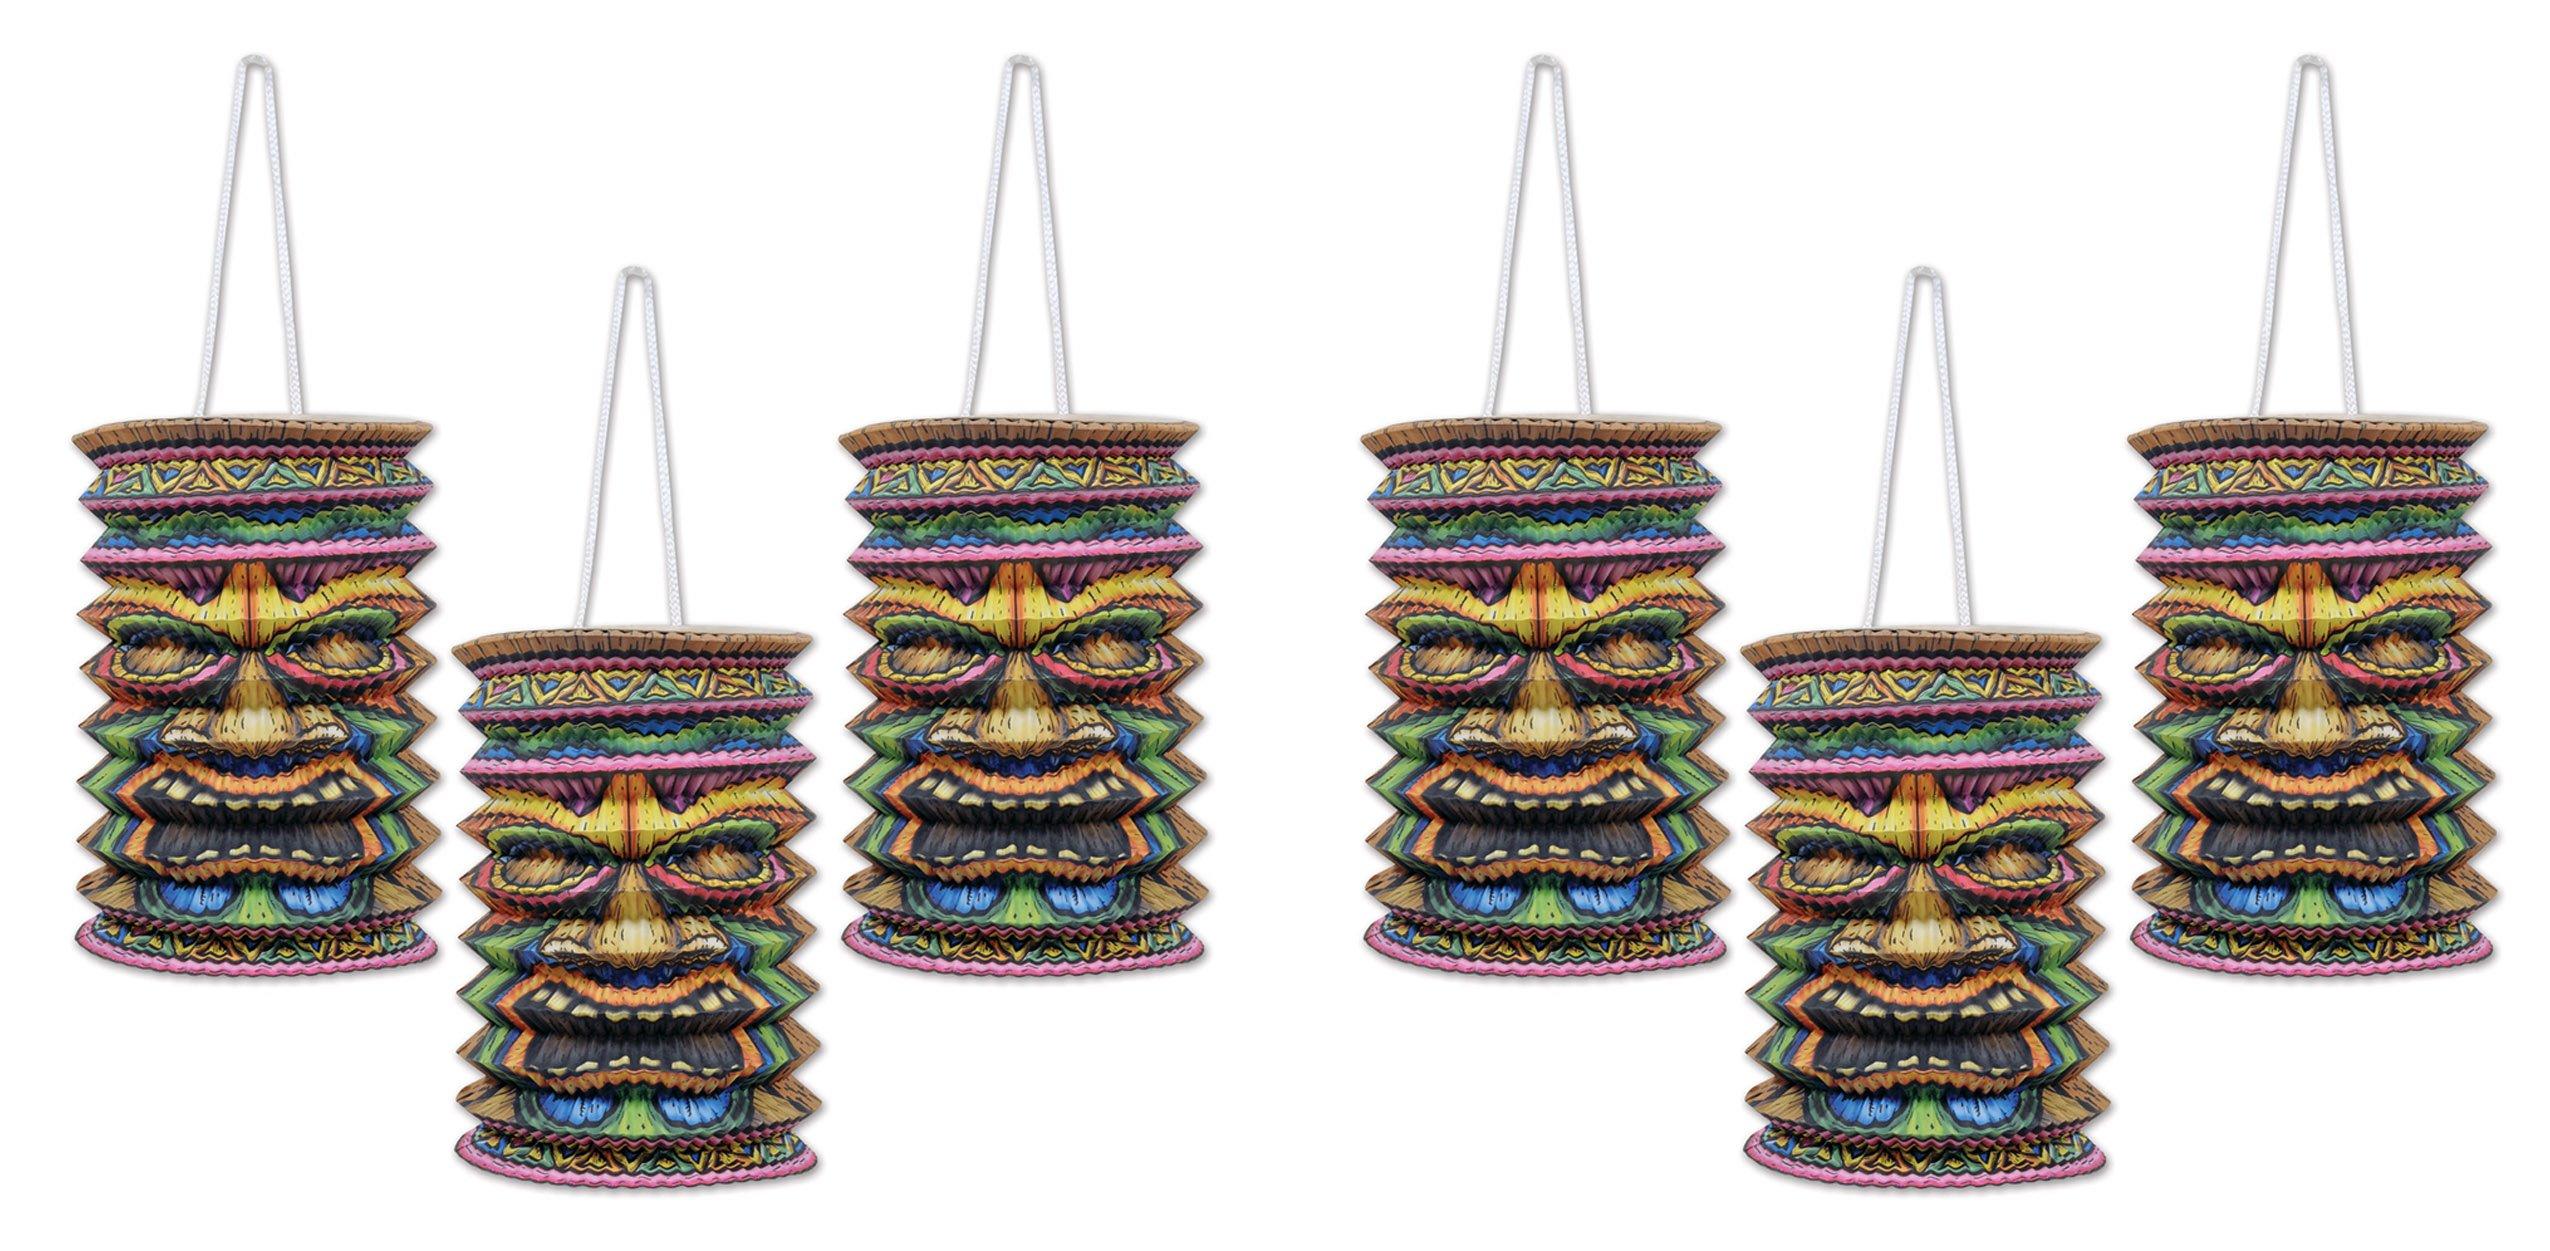 Beistle S54563AZ2 Tiki Paper Lanterns 6 Piece, Multicolored